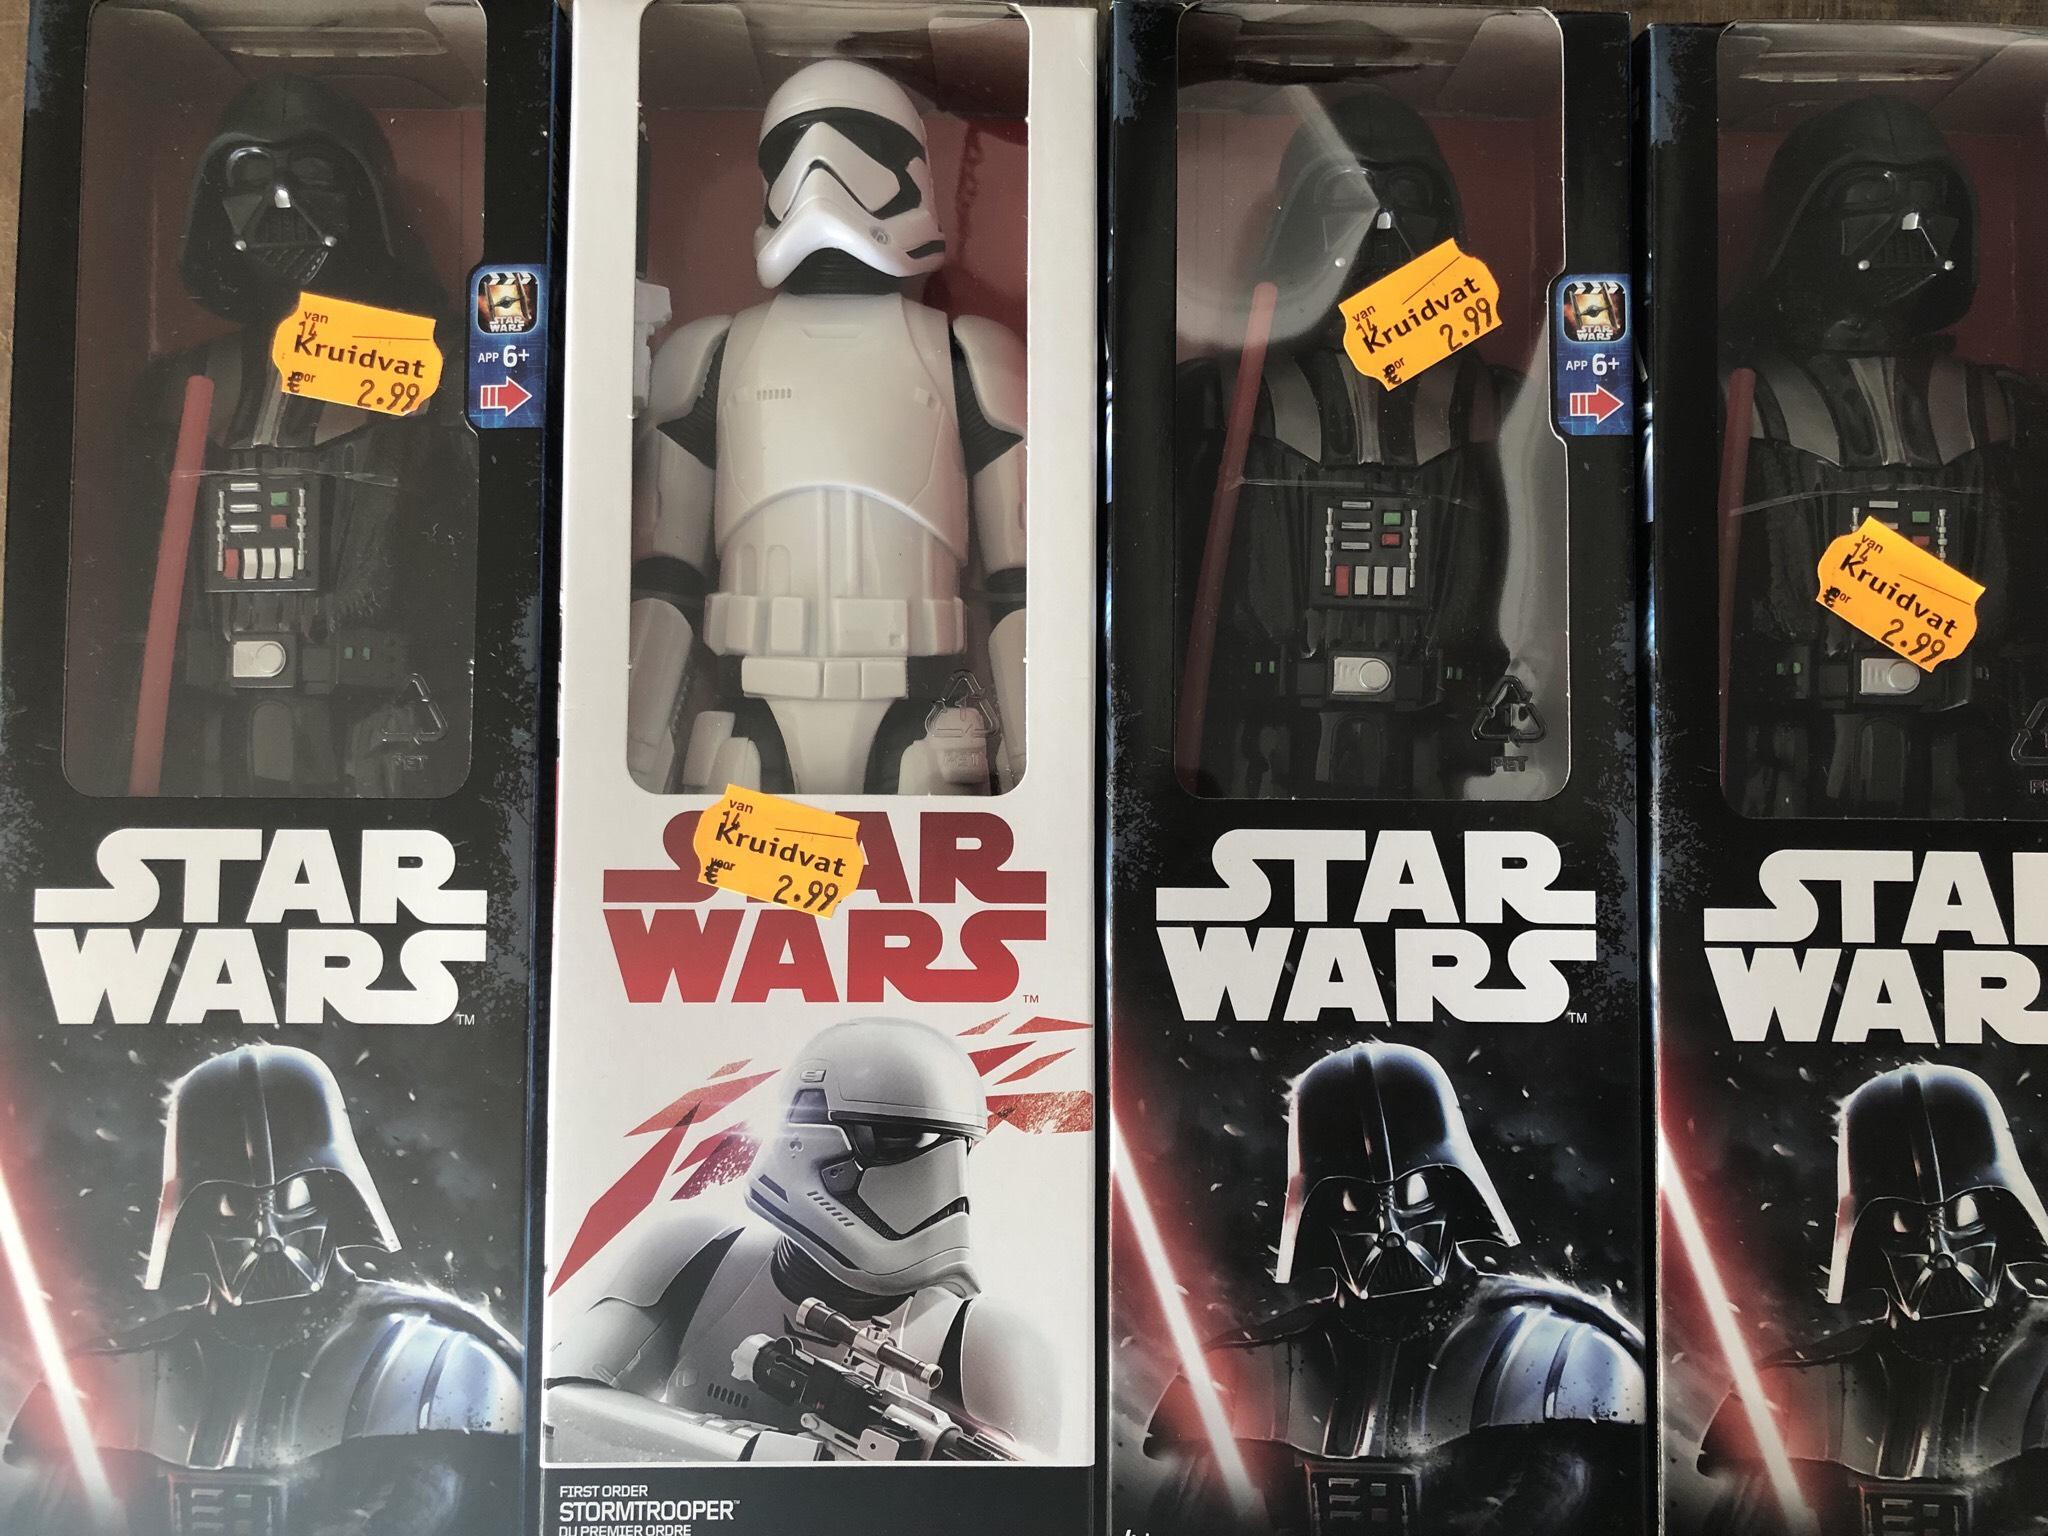 Star Wars poppen 30cm Disney Hasbro voor 2,99 - Kruidvat